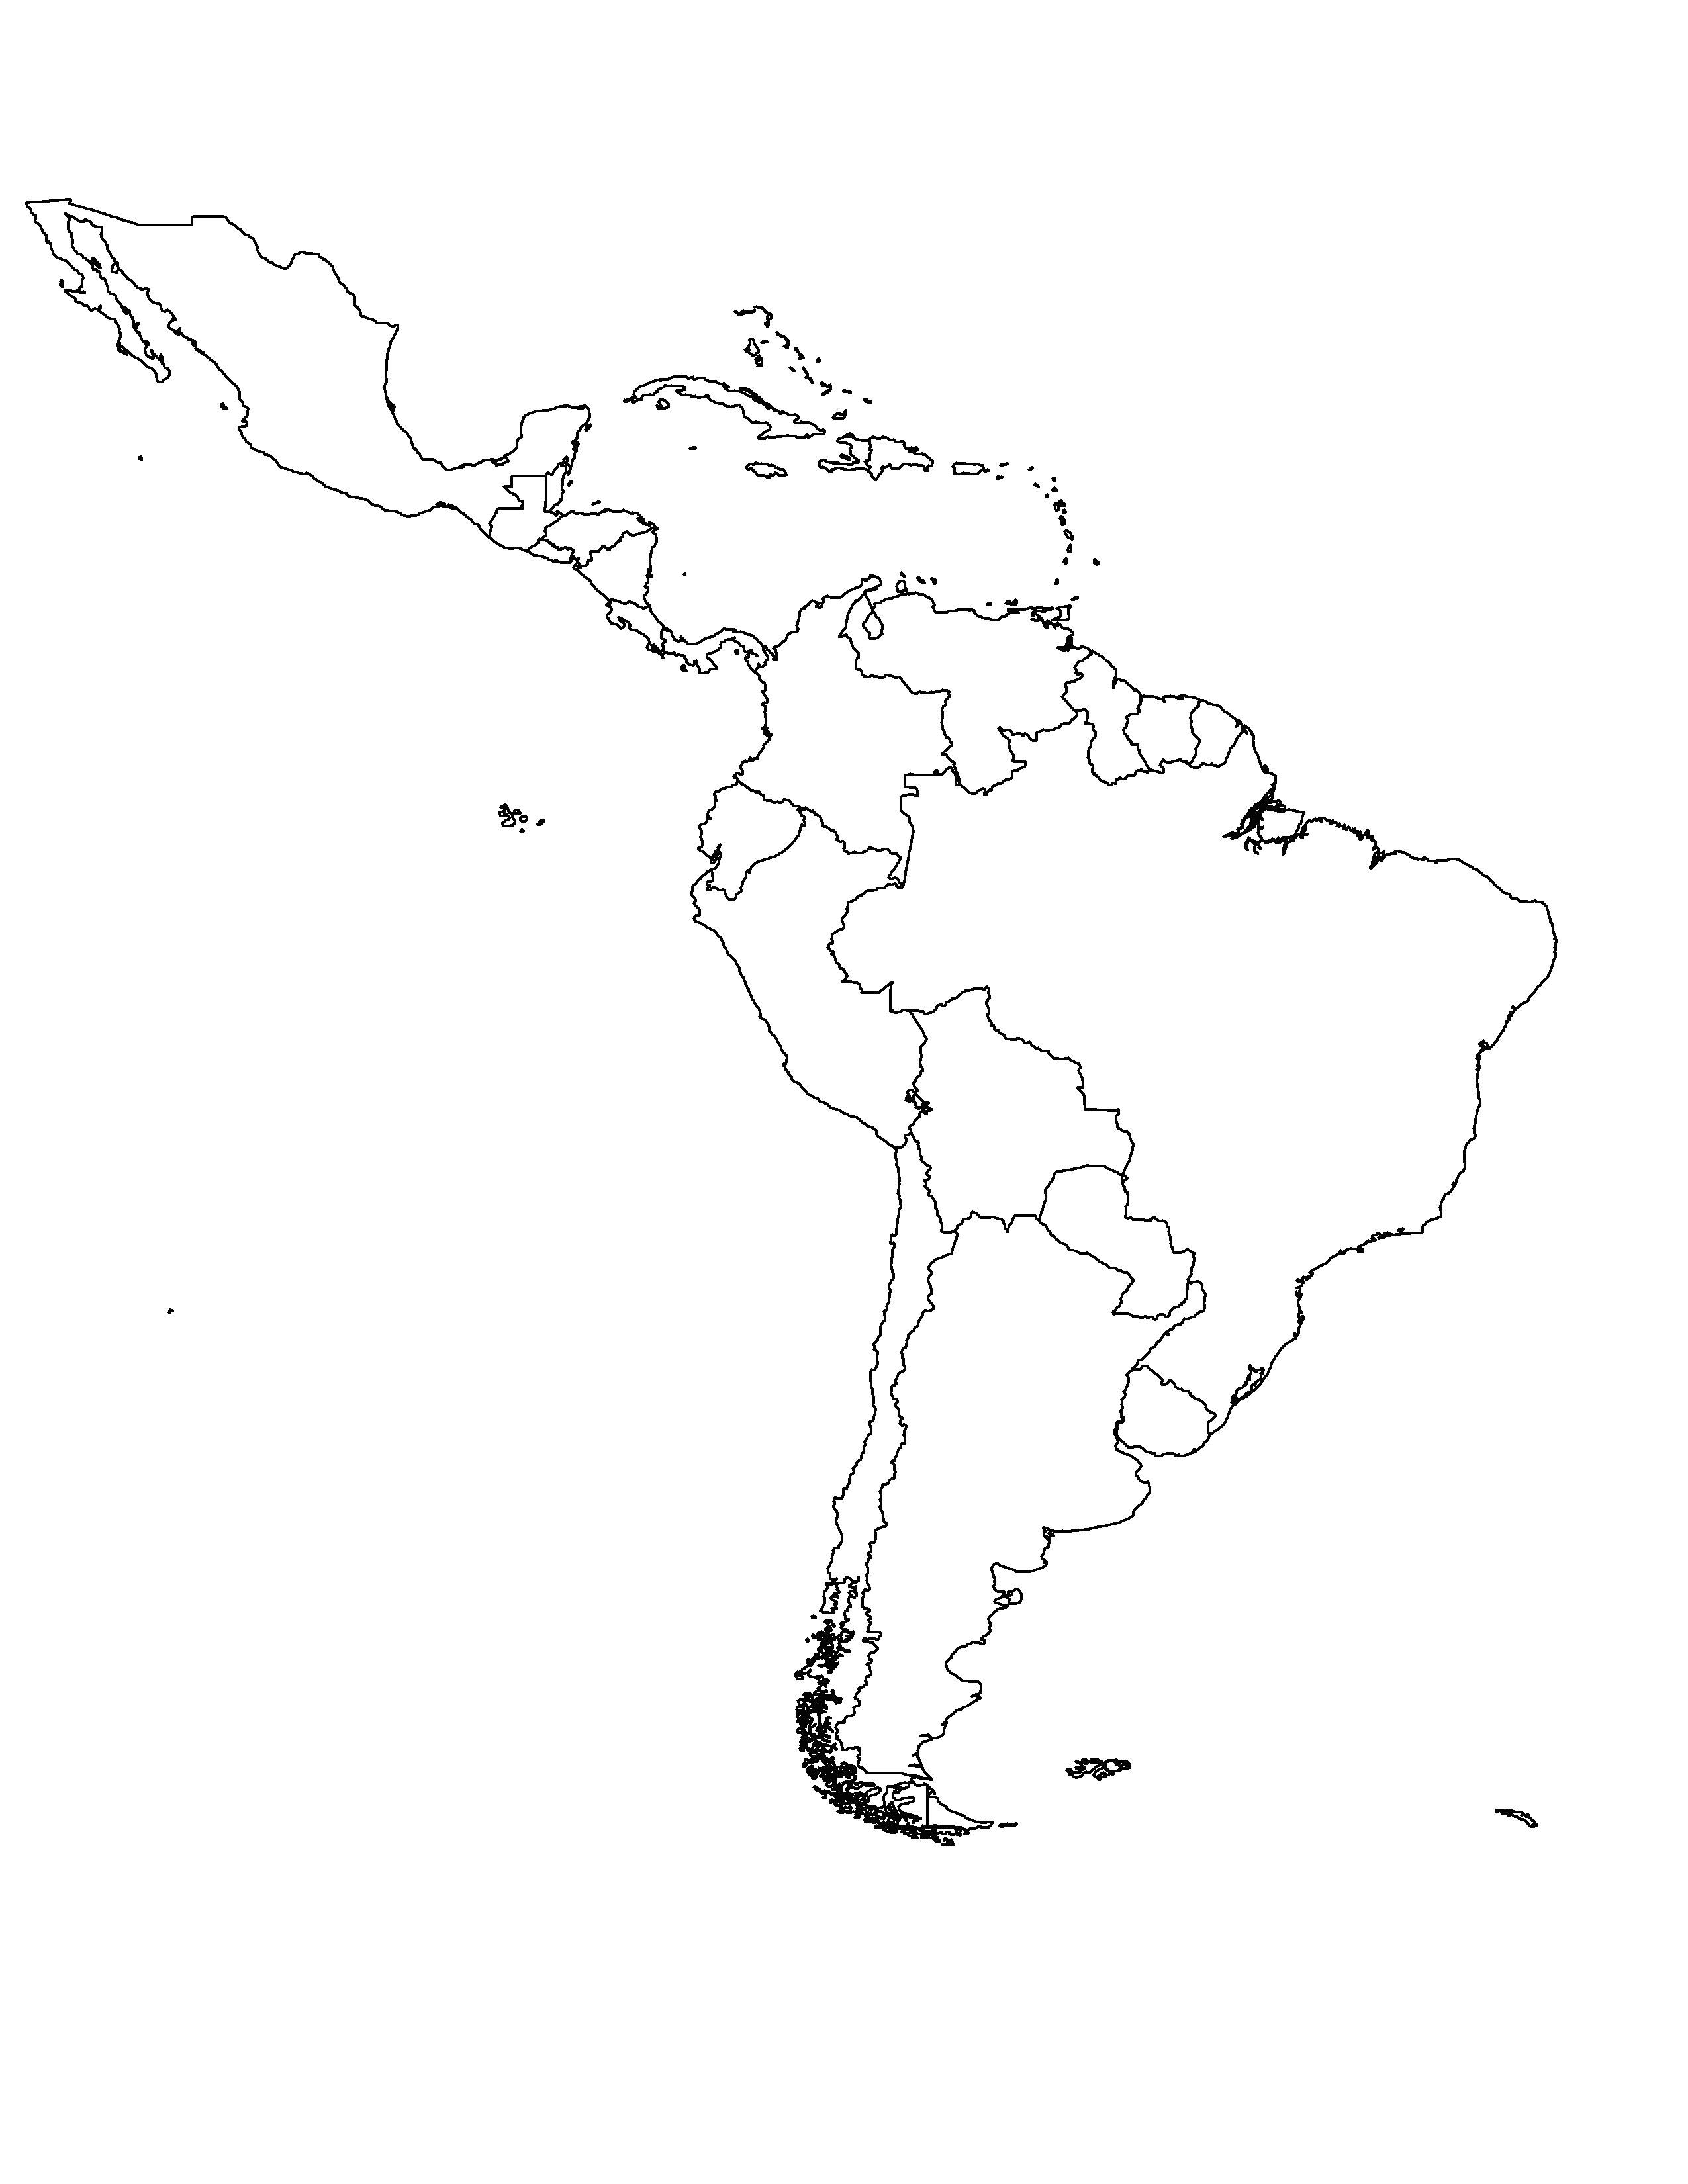 Mexico Map Drawing At Getdrawings